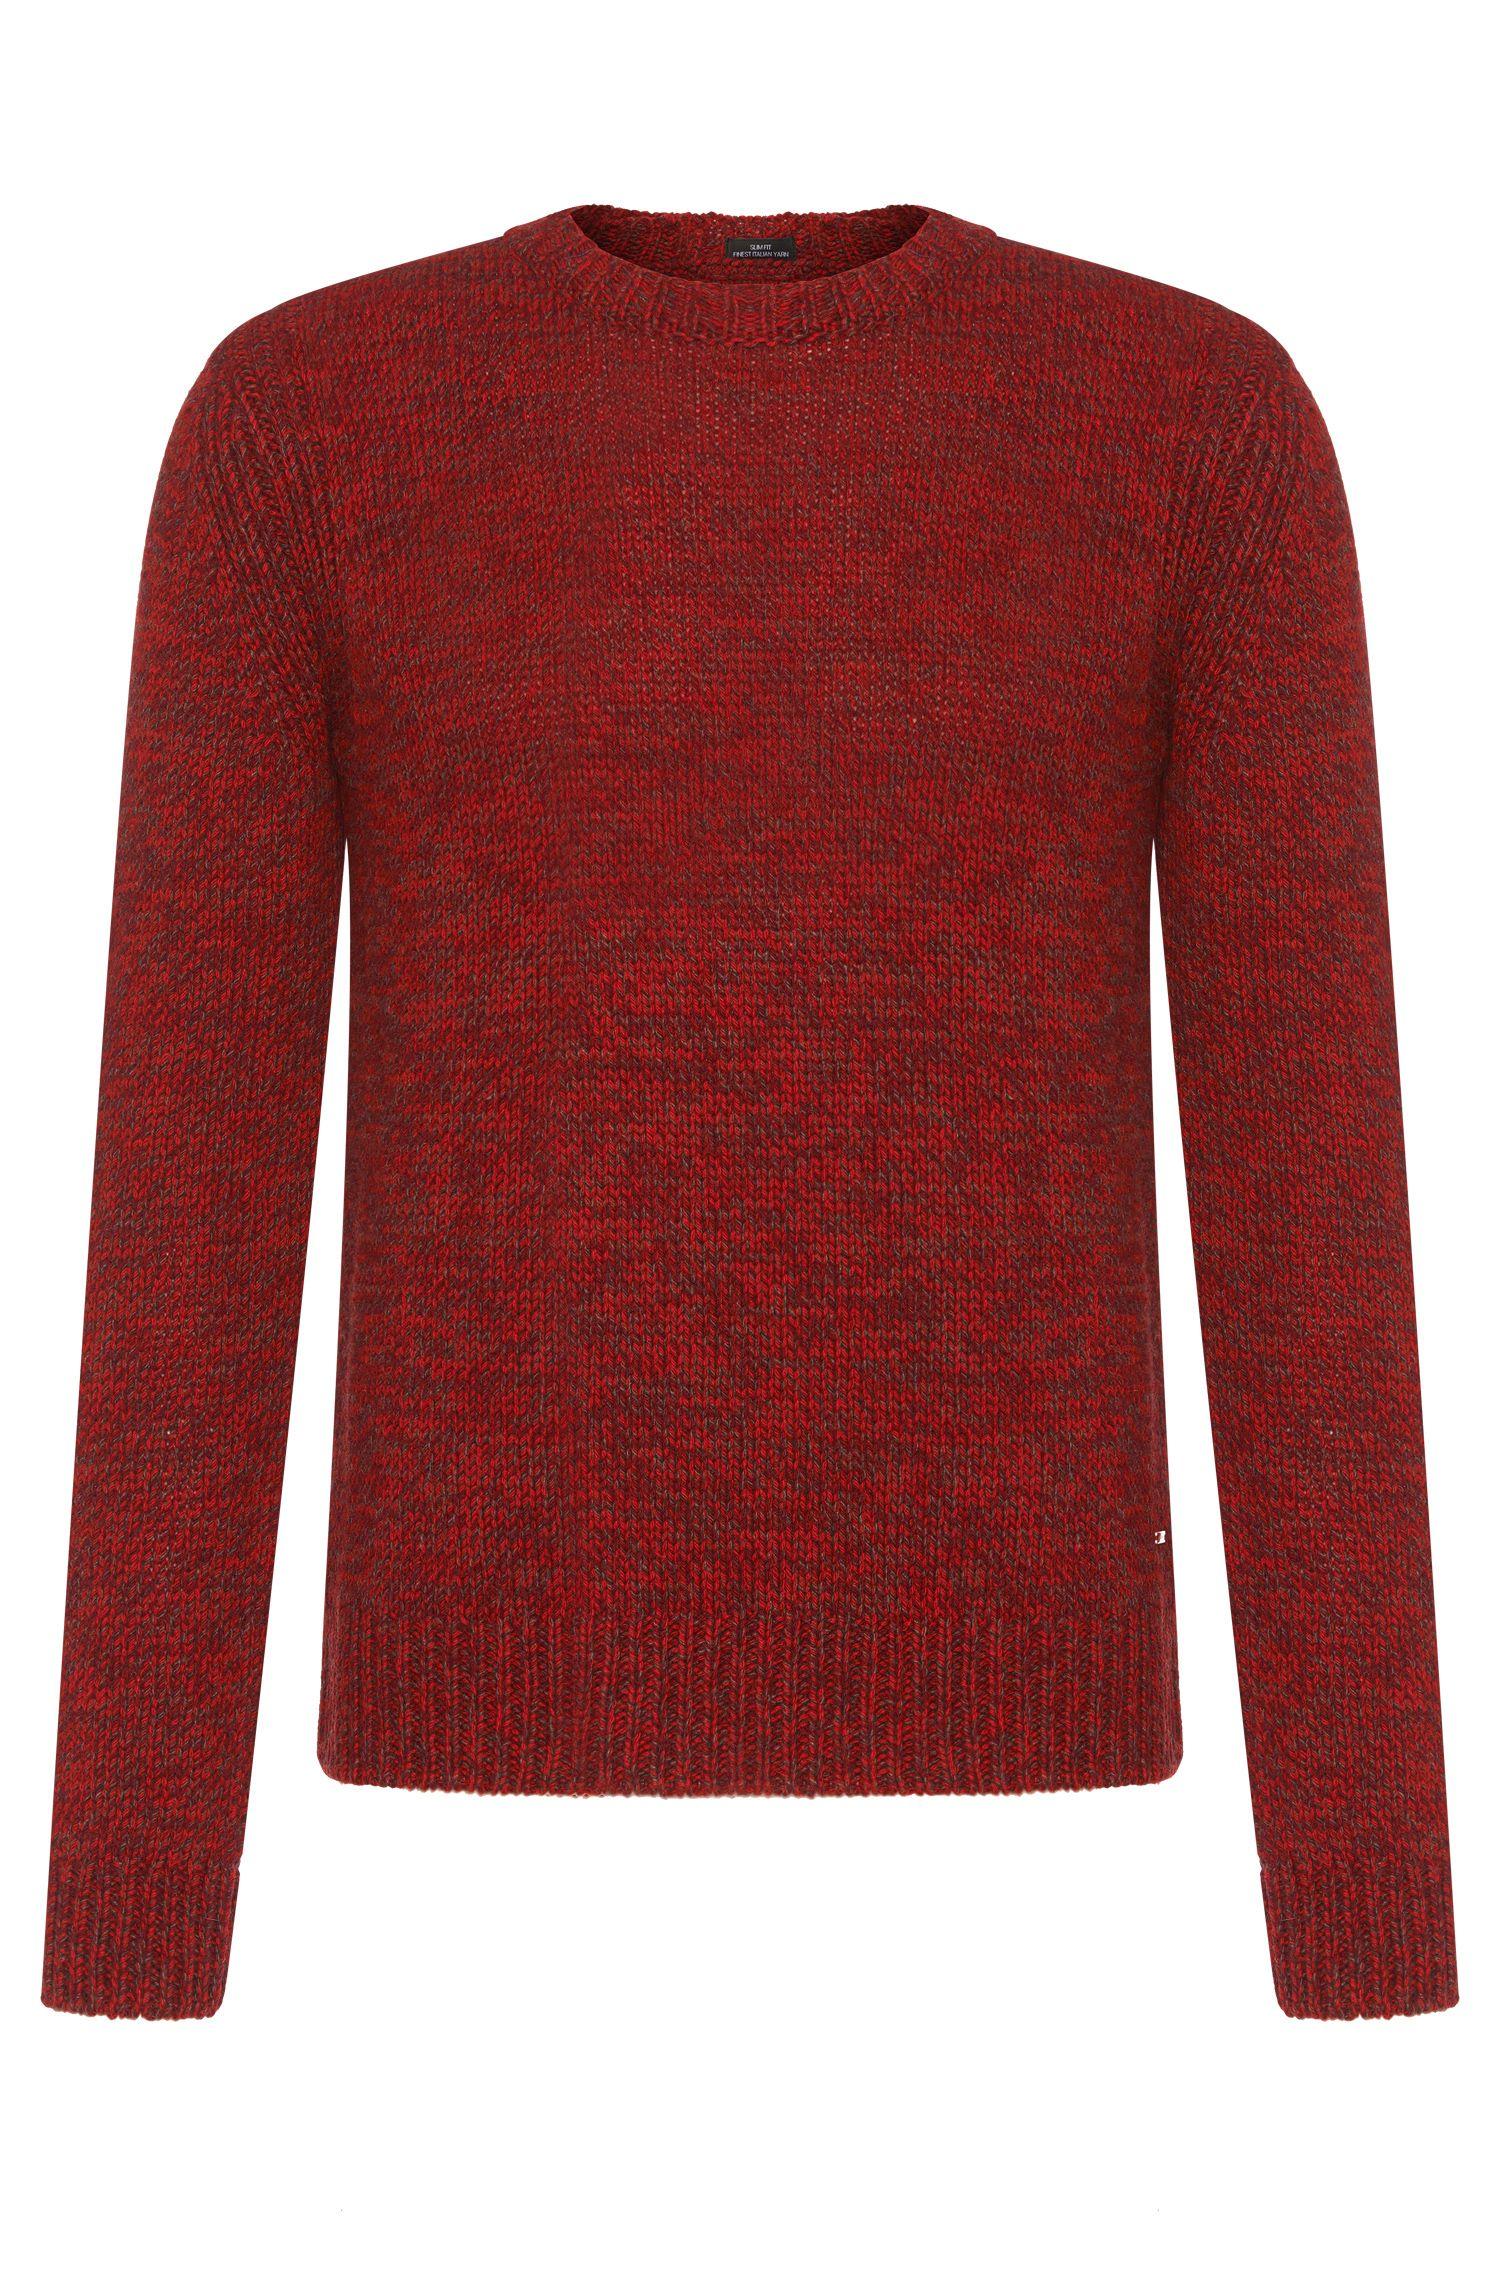 'T-Bianchi' | Italian Cashmere Wool Melange Sweater